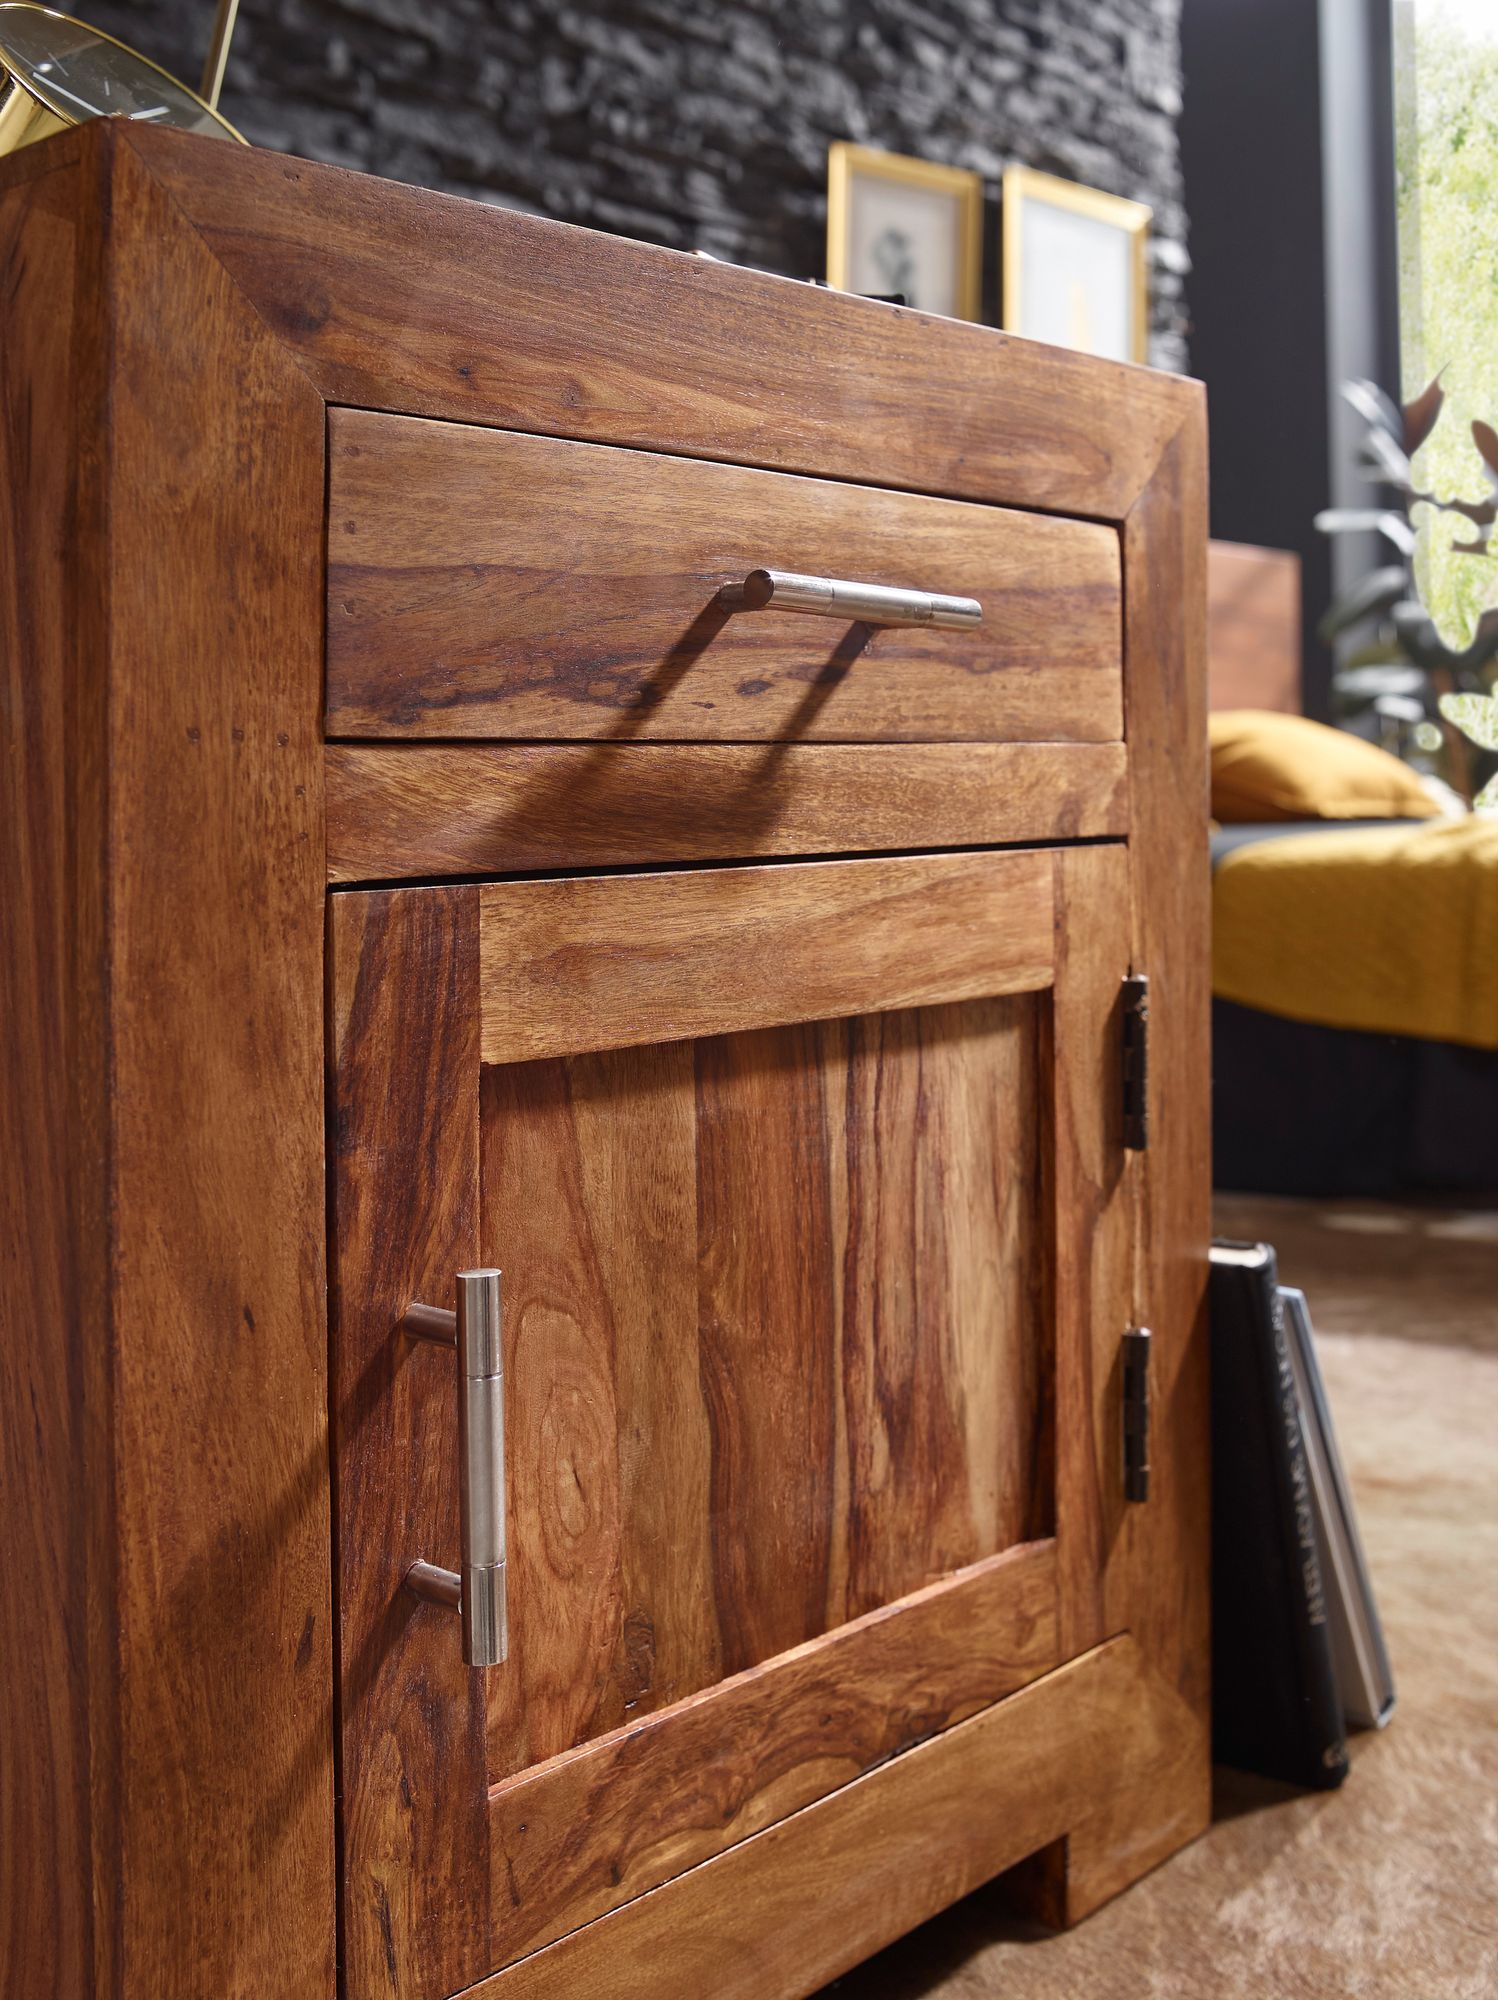 finebuy nachttisch massivholz 60 cm nachtschrank. Black Bedroom Furniture Sets. Home Design Ideas